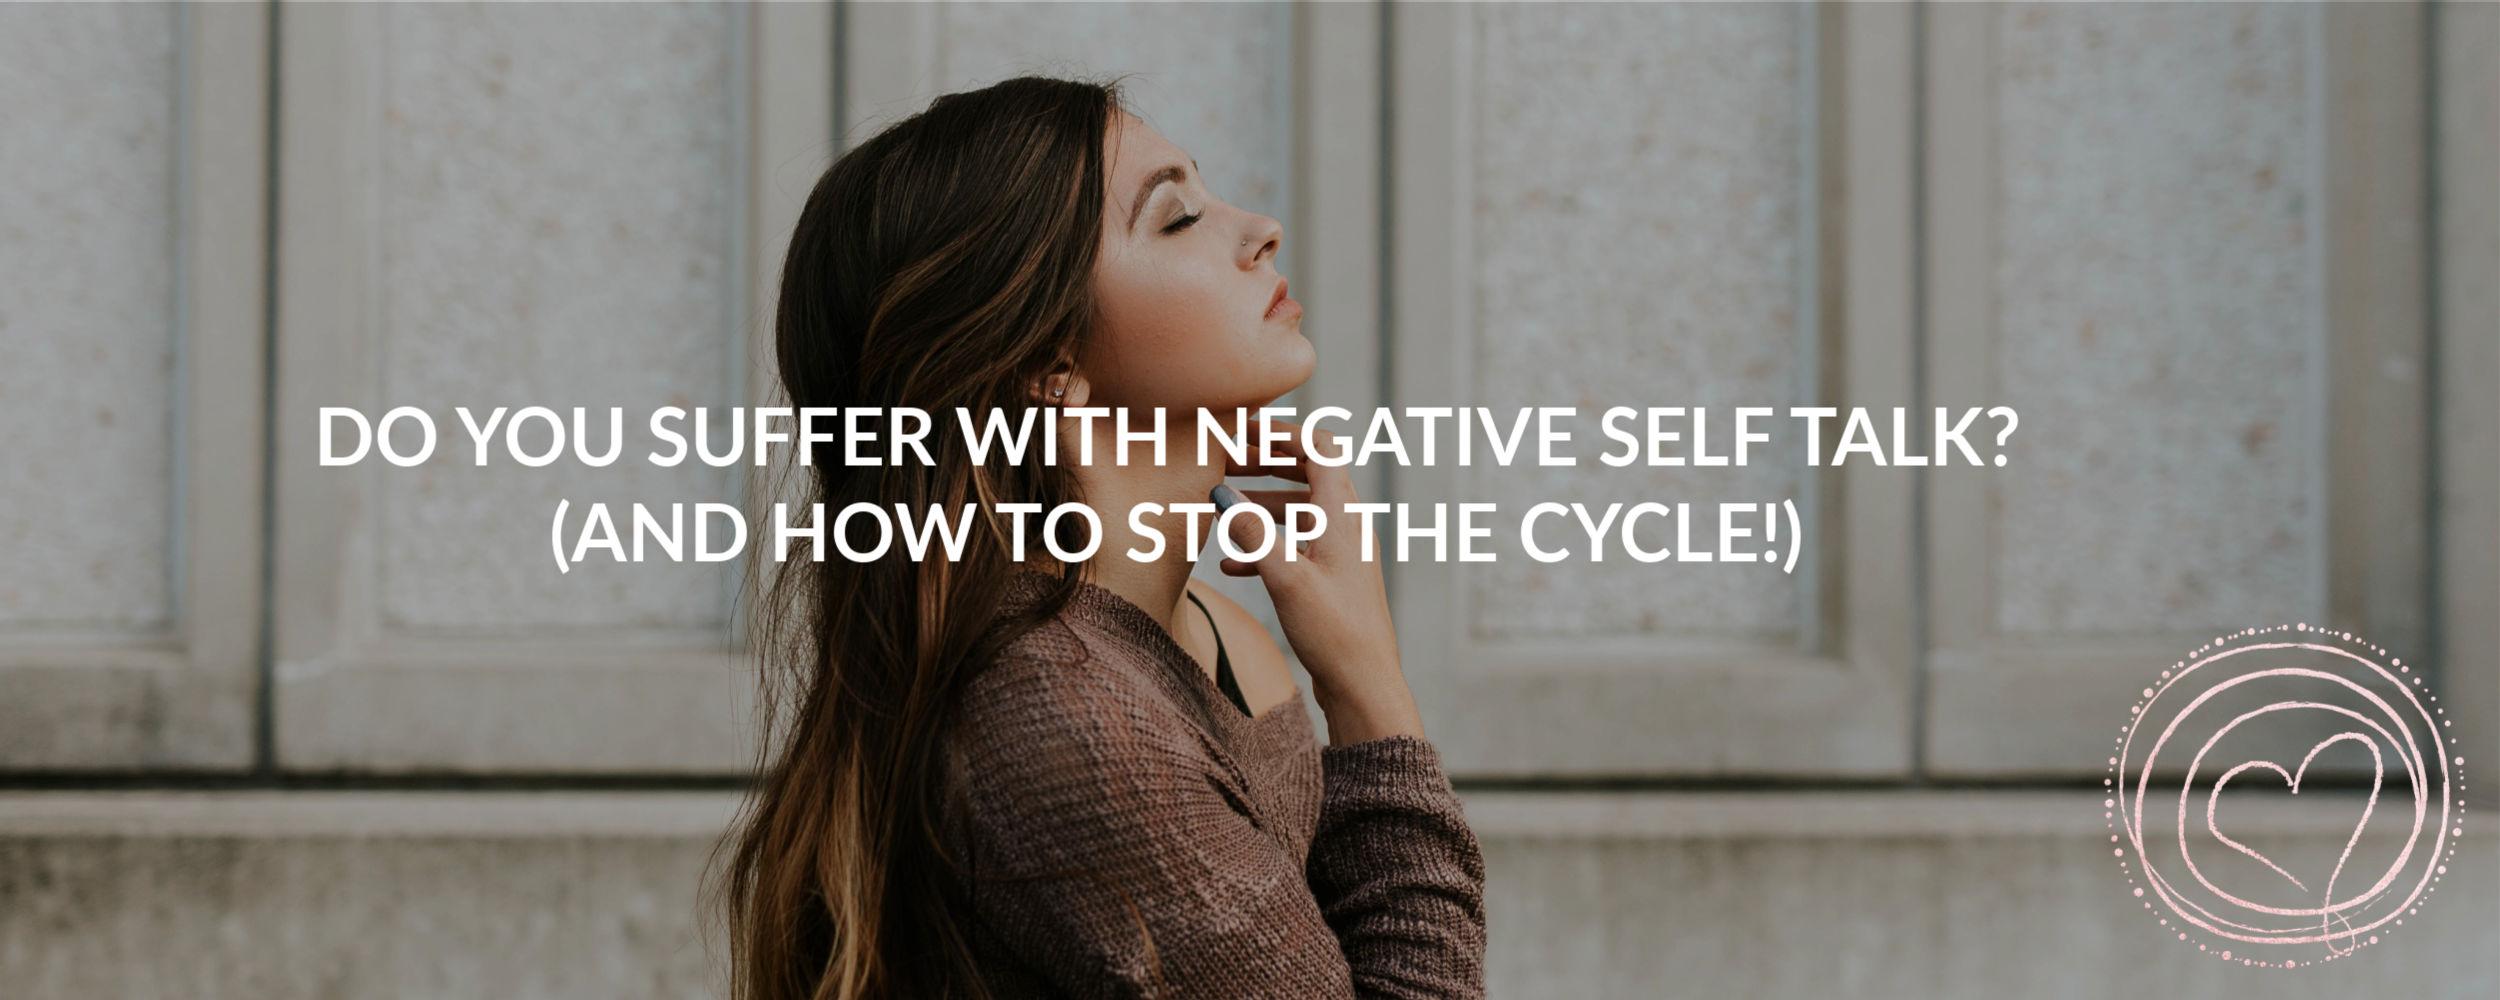 negative self talk banner.jpg